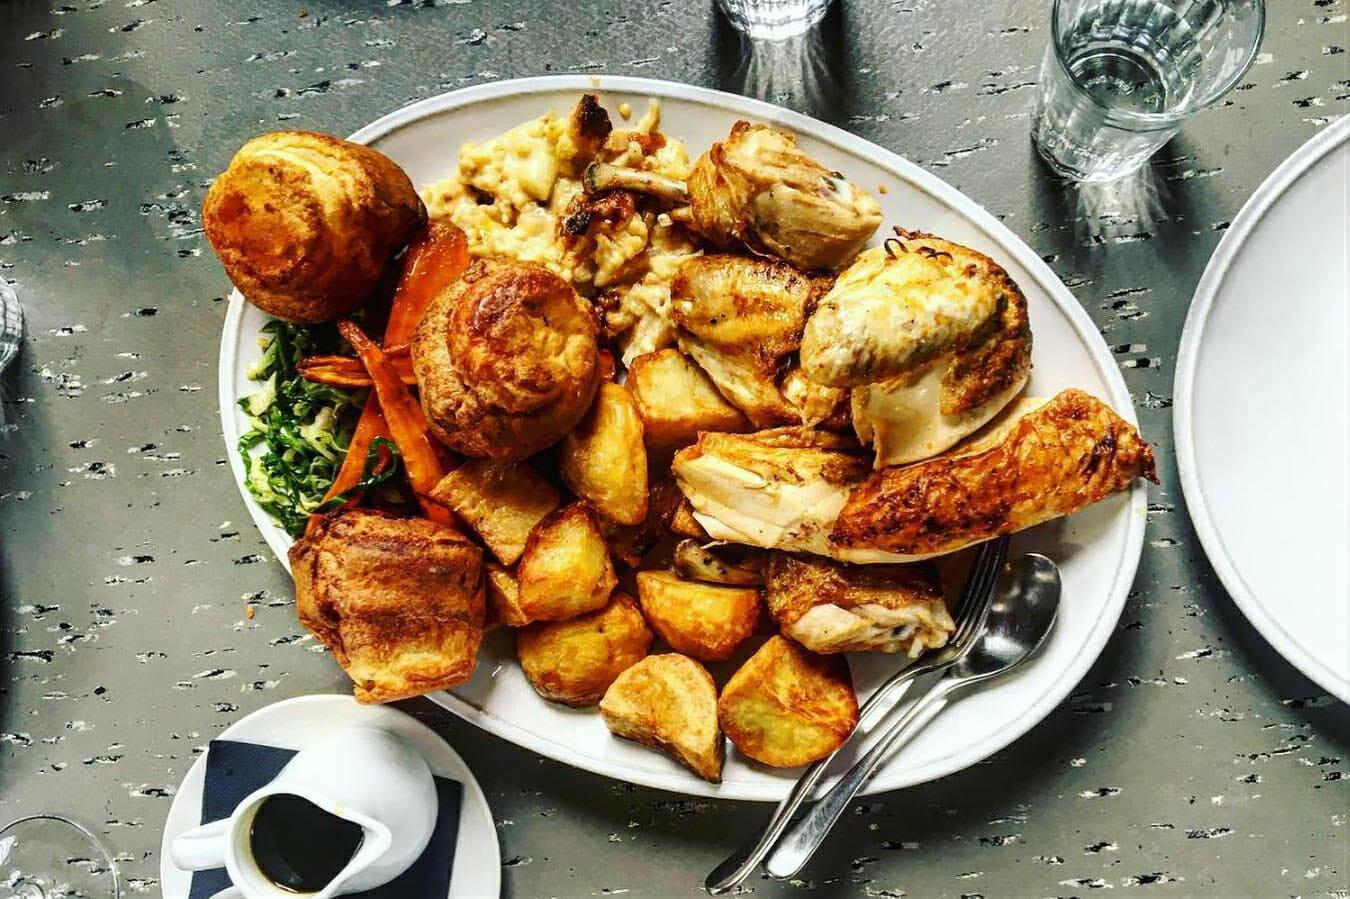 Culpeper Sunday roast